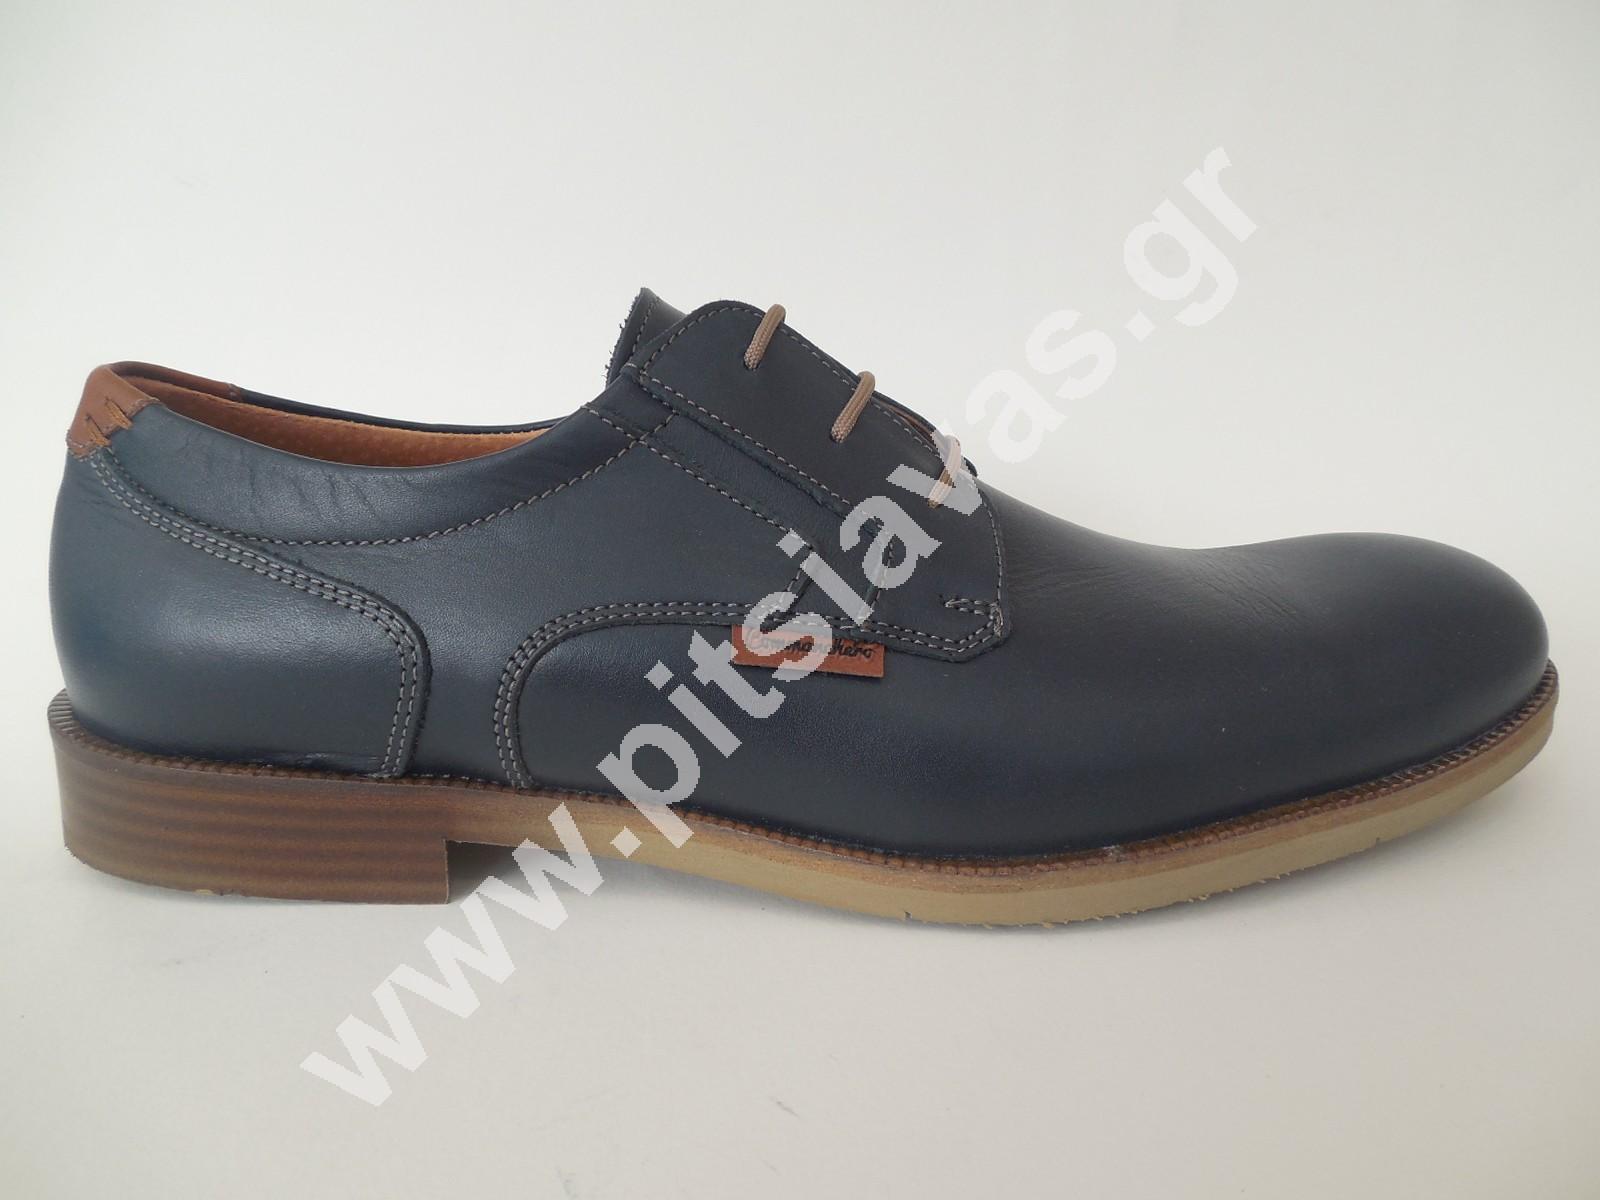 7abadd20f17 Commanchero ανδρικό παπούτσι 91693 μπλε δέρμα - pitsiavas